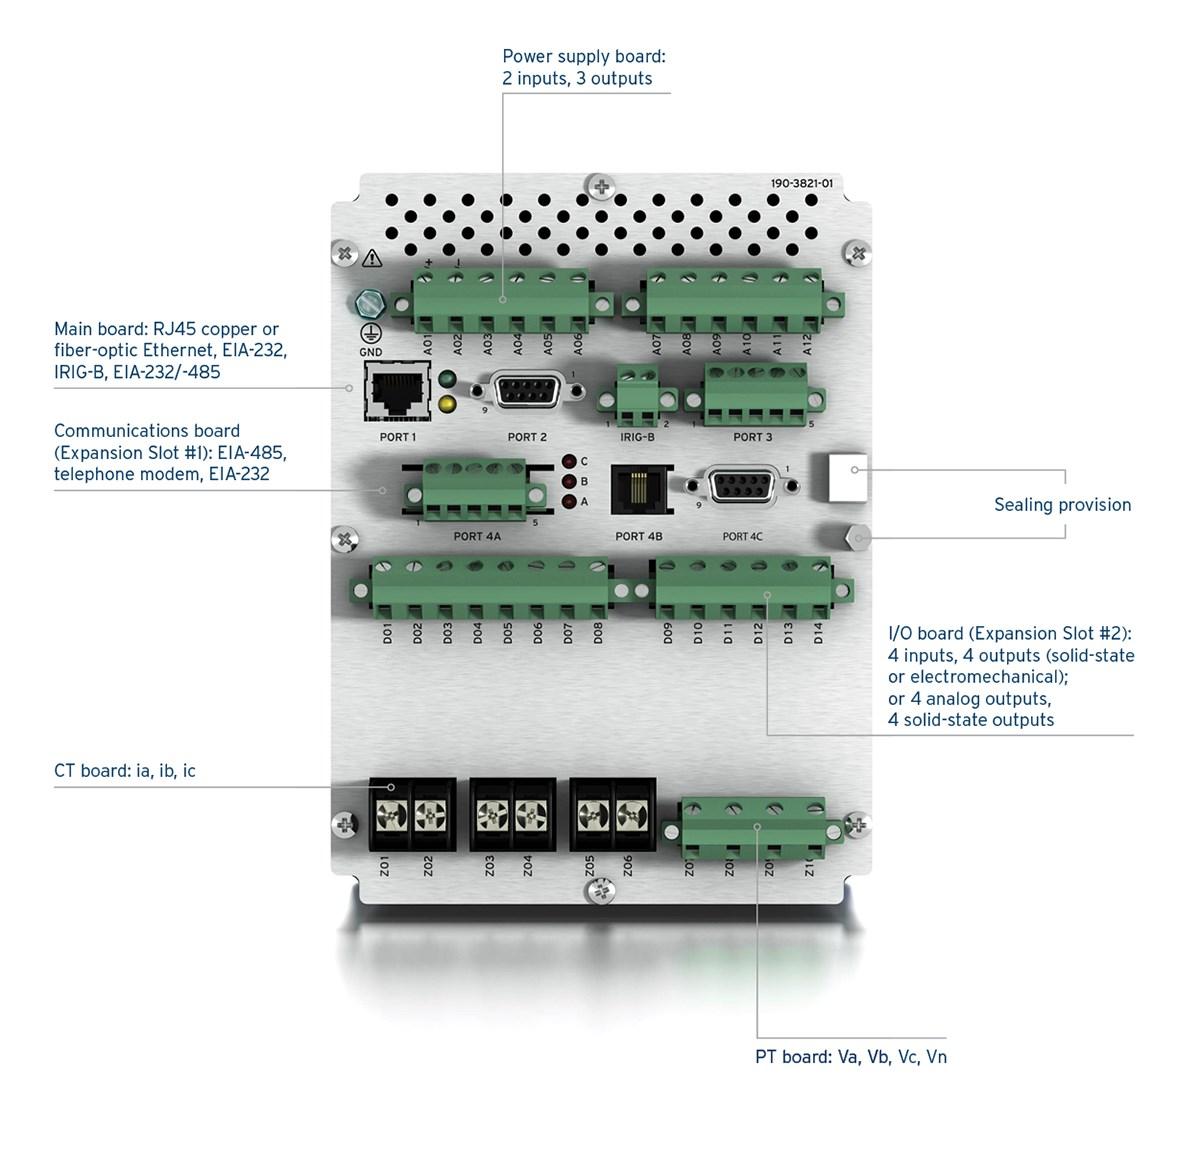 735_visual_back?n=63621542962000&preset=size col 12&bp=md sel 735 power quality and revenue meter schweitzer engineering sel 735 wiring diagram at n-0.co